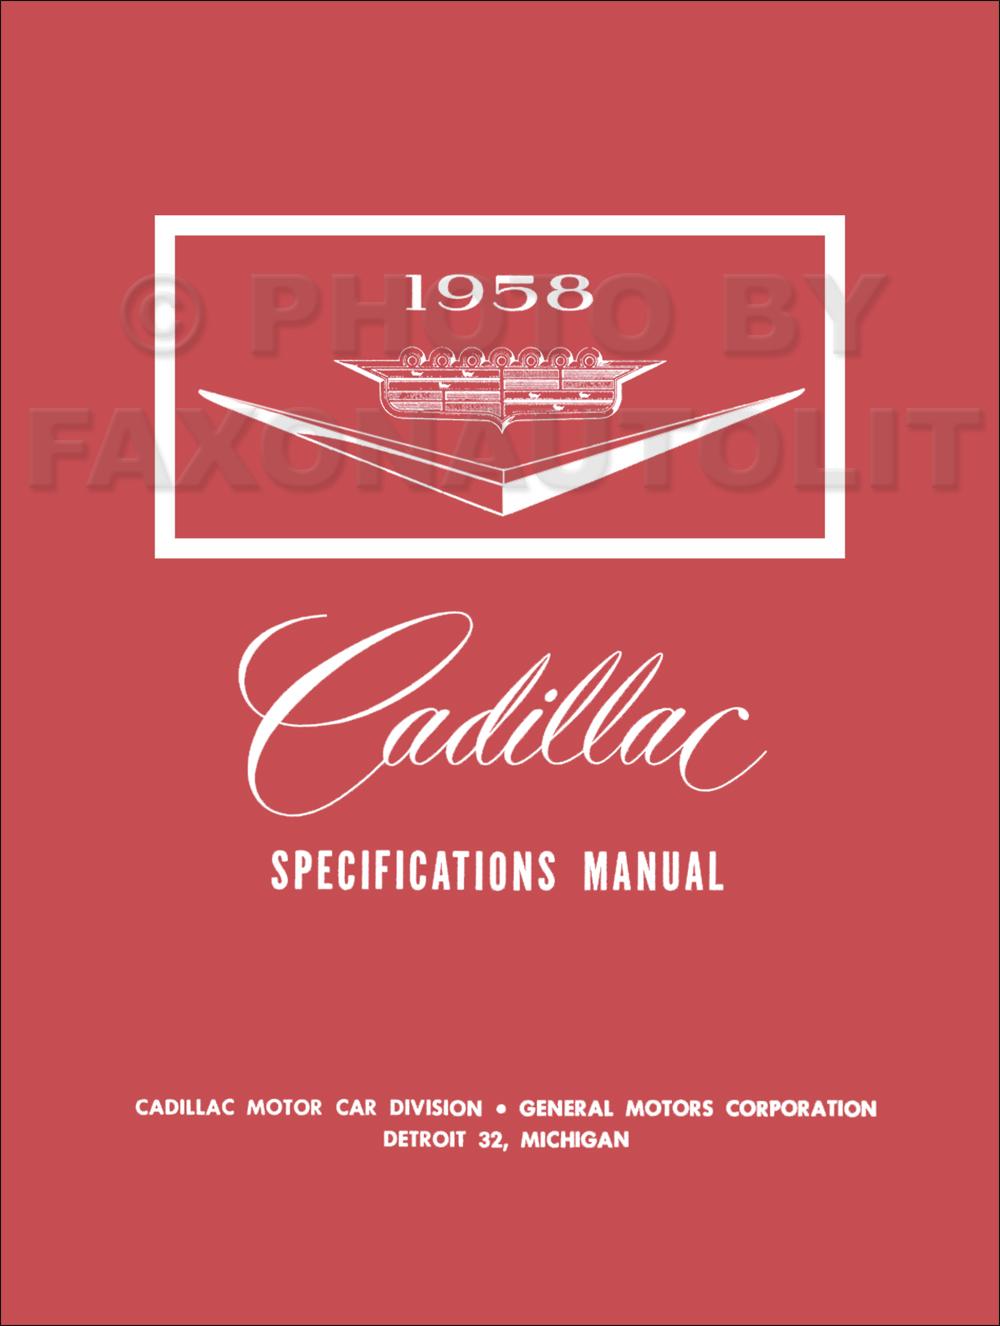 Cad Fleet Ccm Wires additionally Cadillaceldoradobroughamfalrrms Toc as well Cadillacrspp moreover Cadillacrrmpcd moreover Cadilacbroughamorm Toc. on 1957 1958 cadillac eldorado brougham repair shop manual supplement